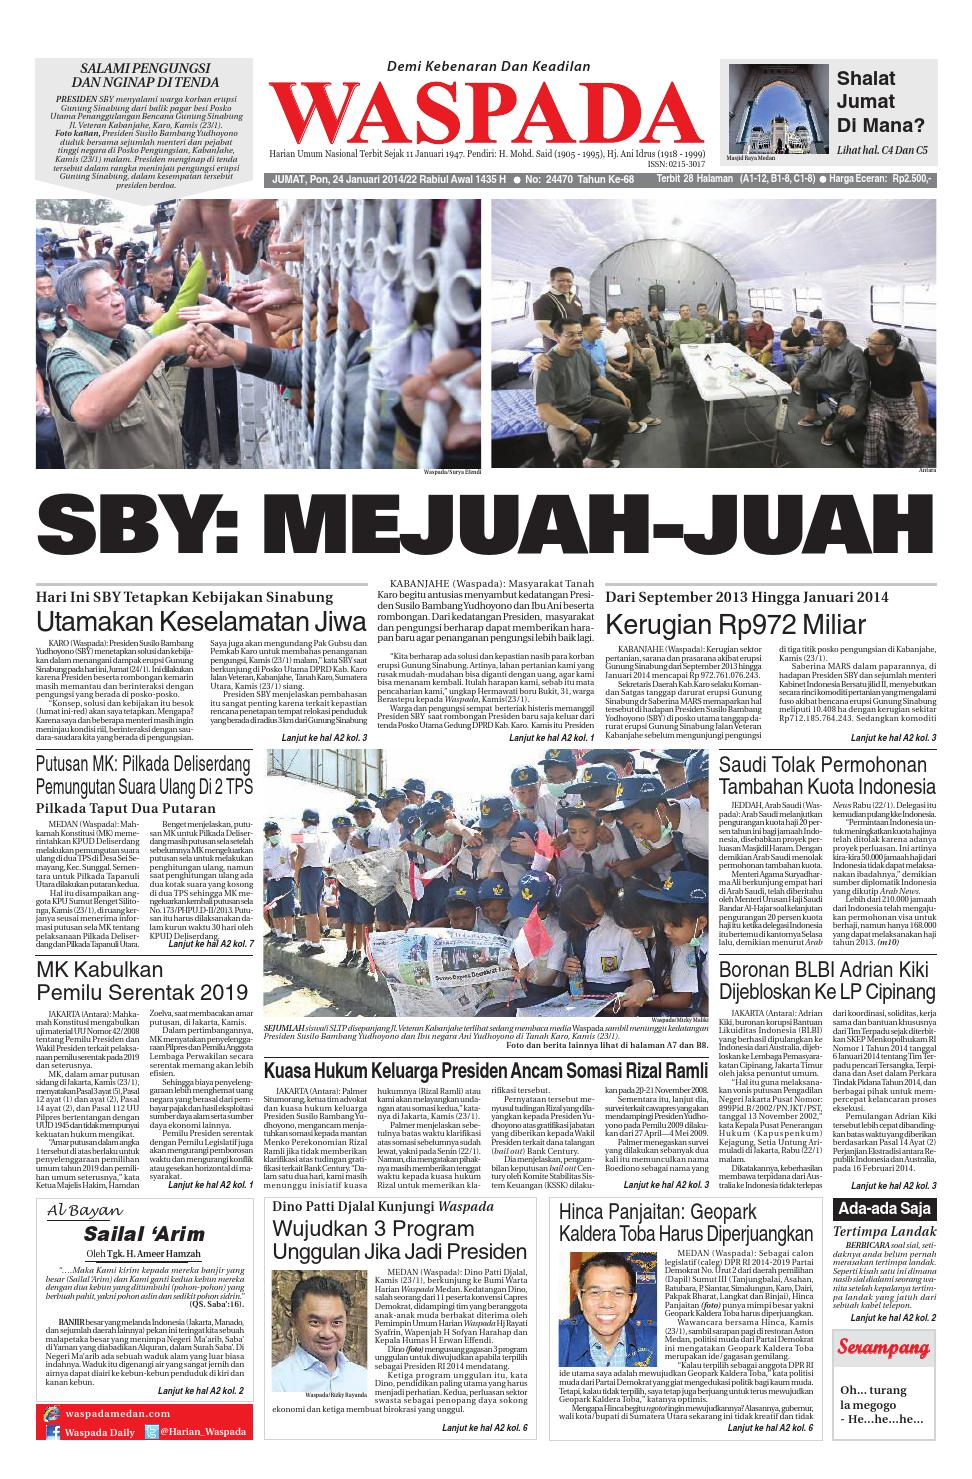 Waspadajumat 24 Januari 2014 By Harian Waspada Issuu Produk Ukm Bumn Madu Super Az Zikra